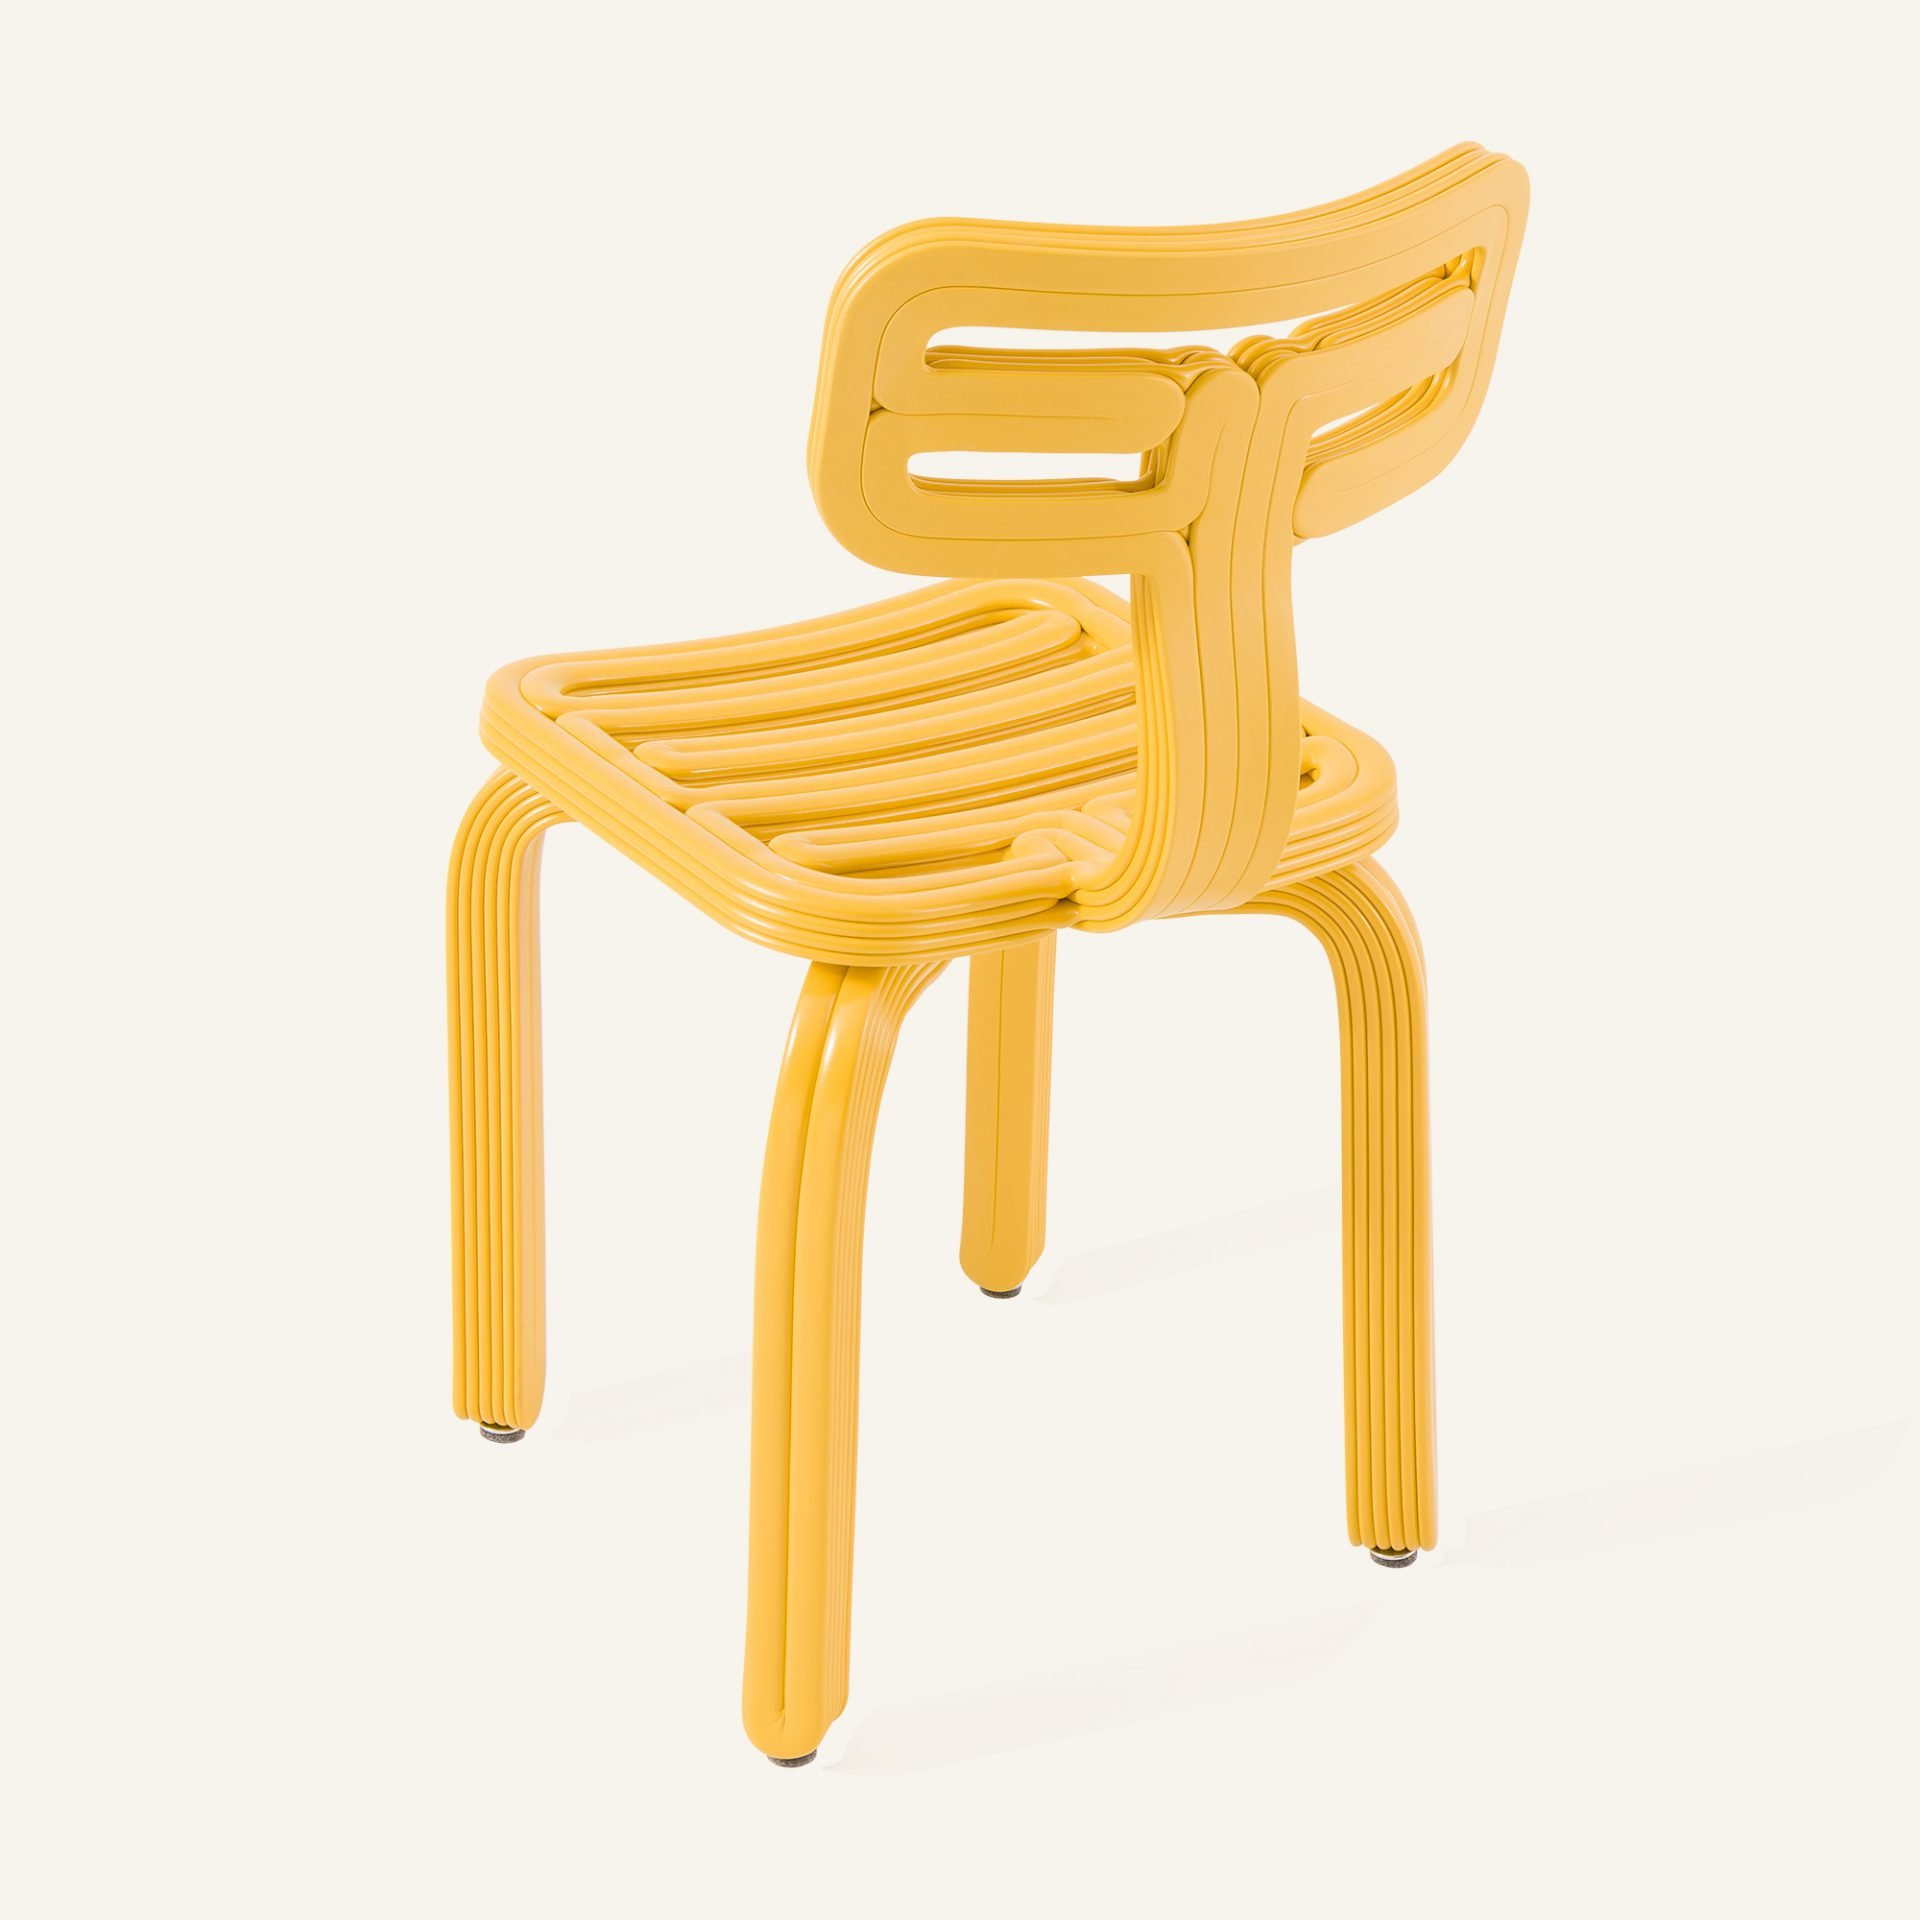 Kooij Chubby Chair Yellow designed by Dirk van der Kooij